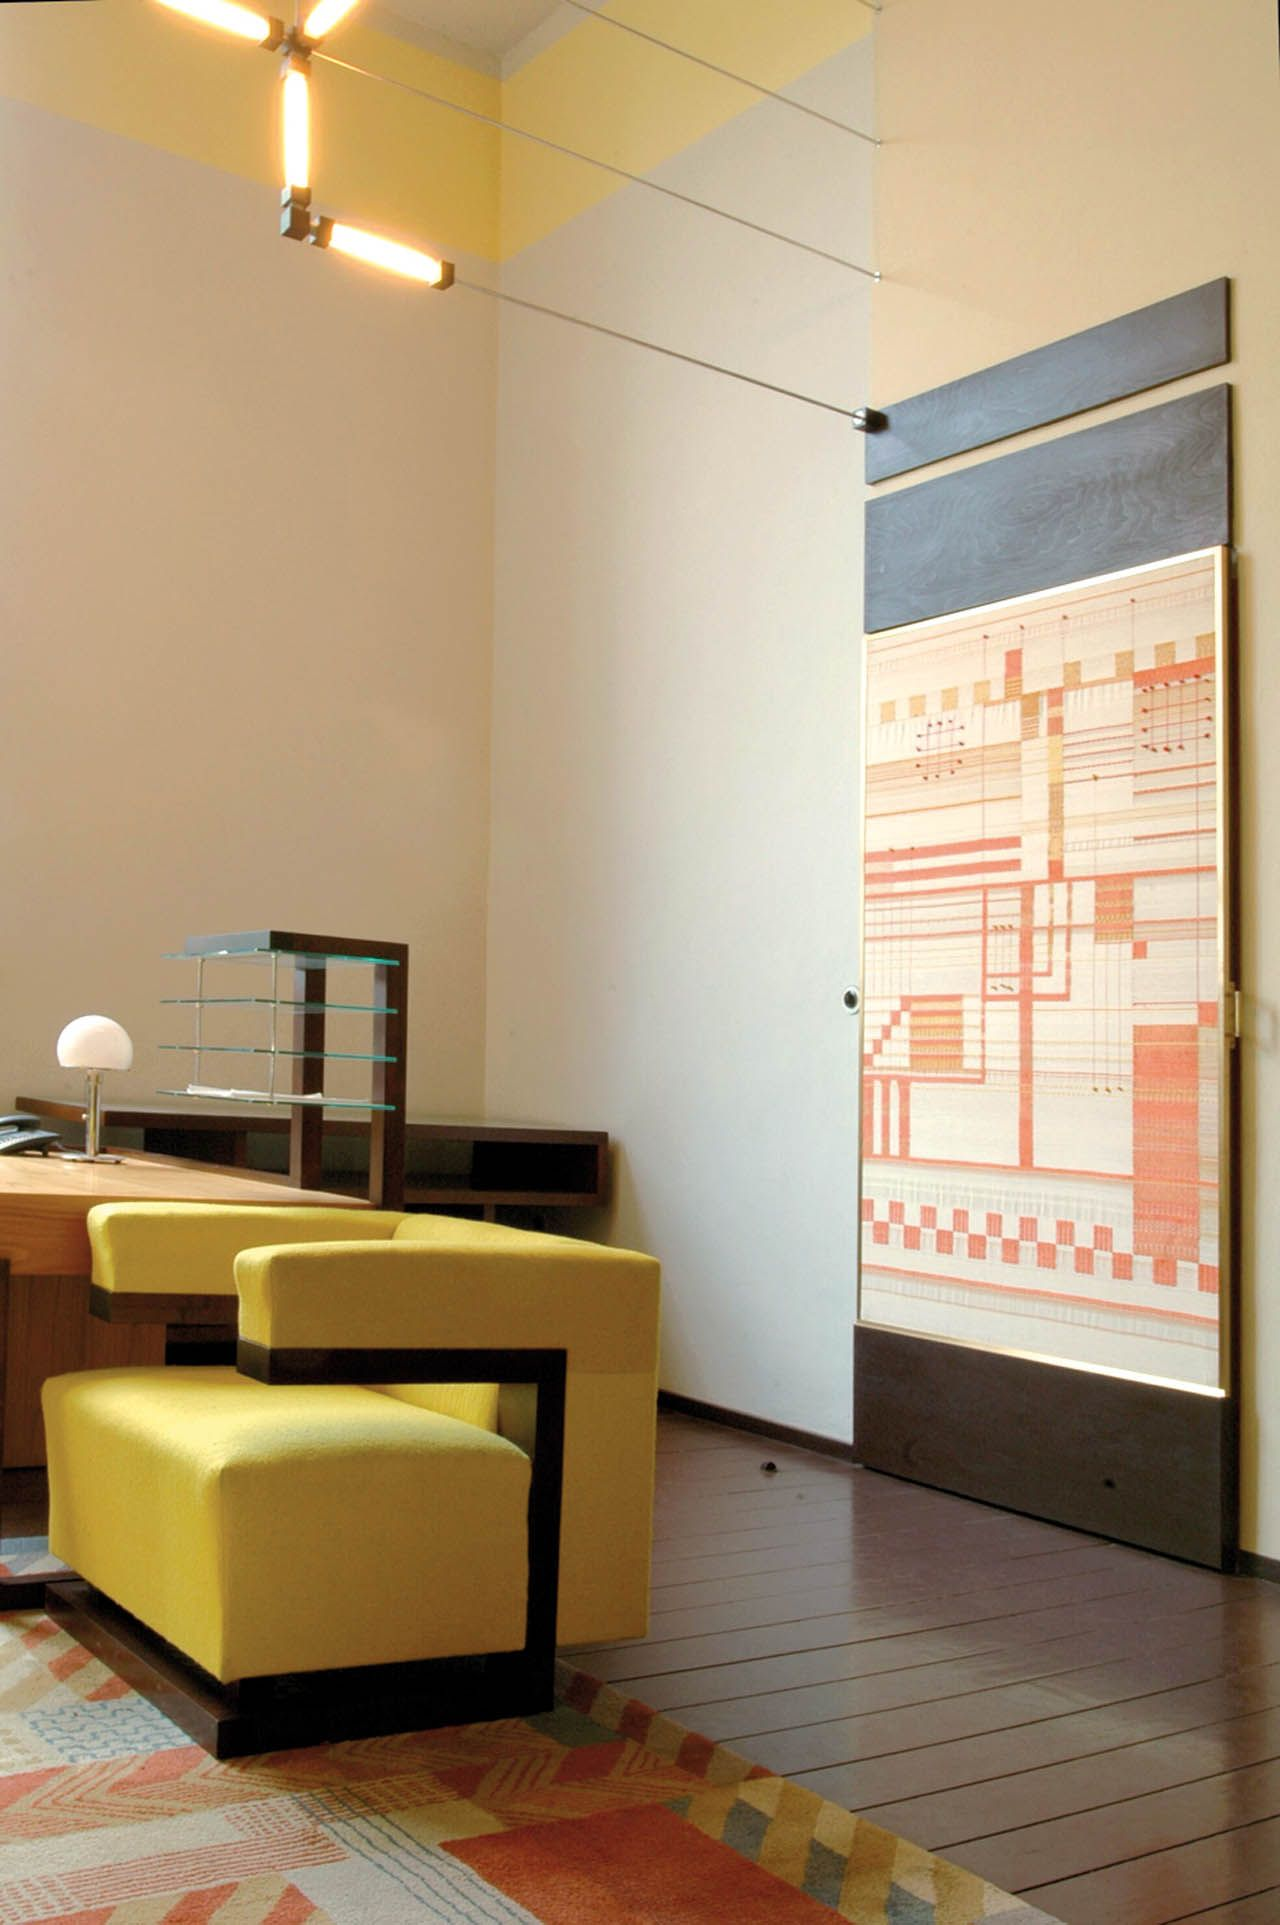 Weimar, Bauhaus University Gropius armchair F51 (1920